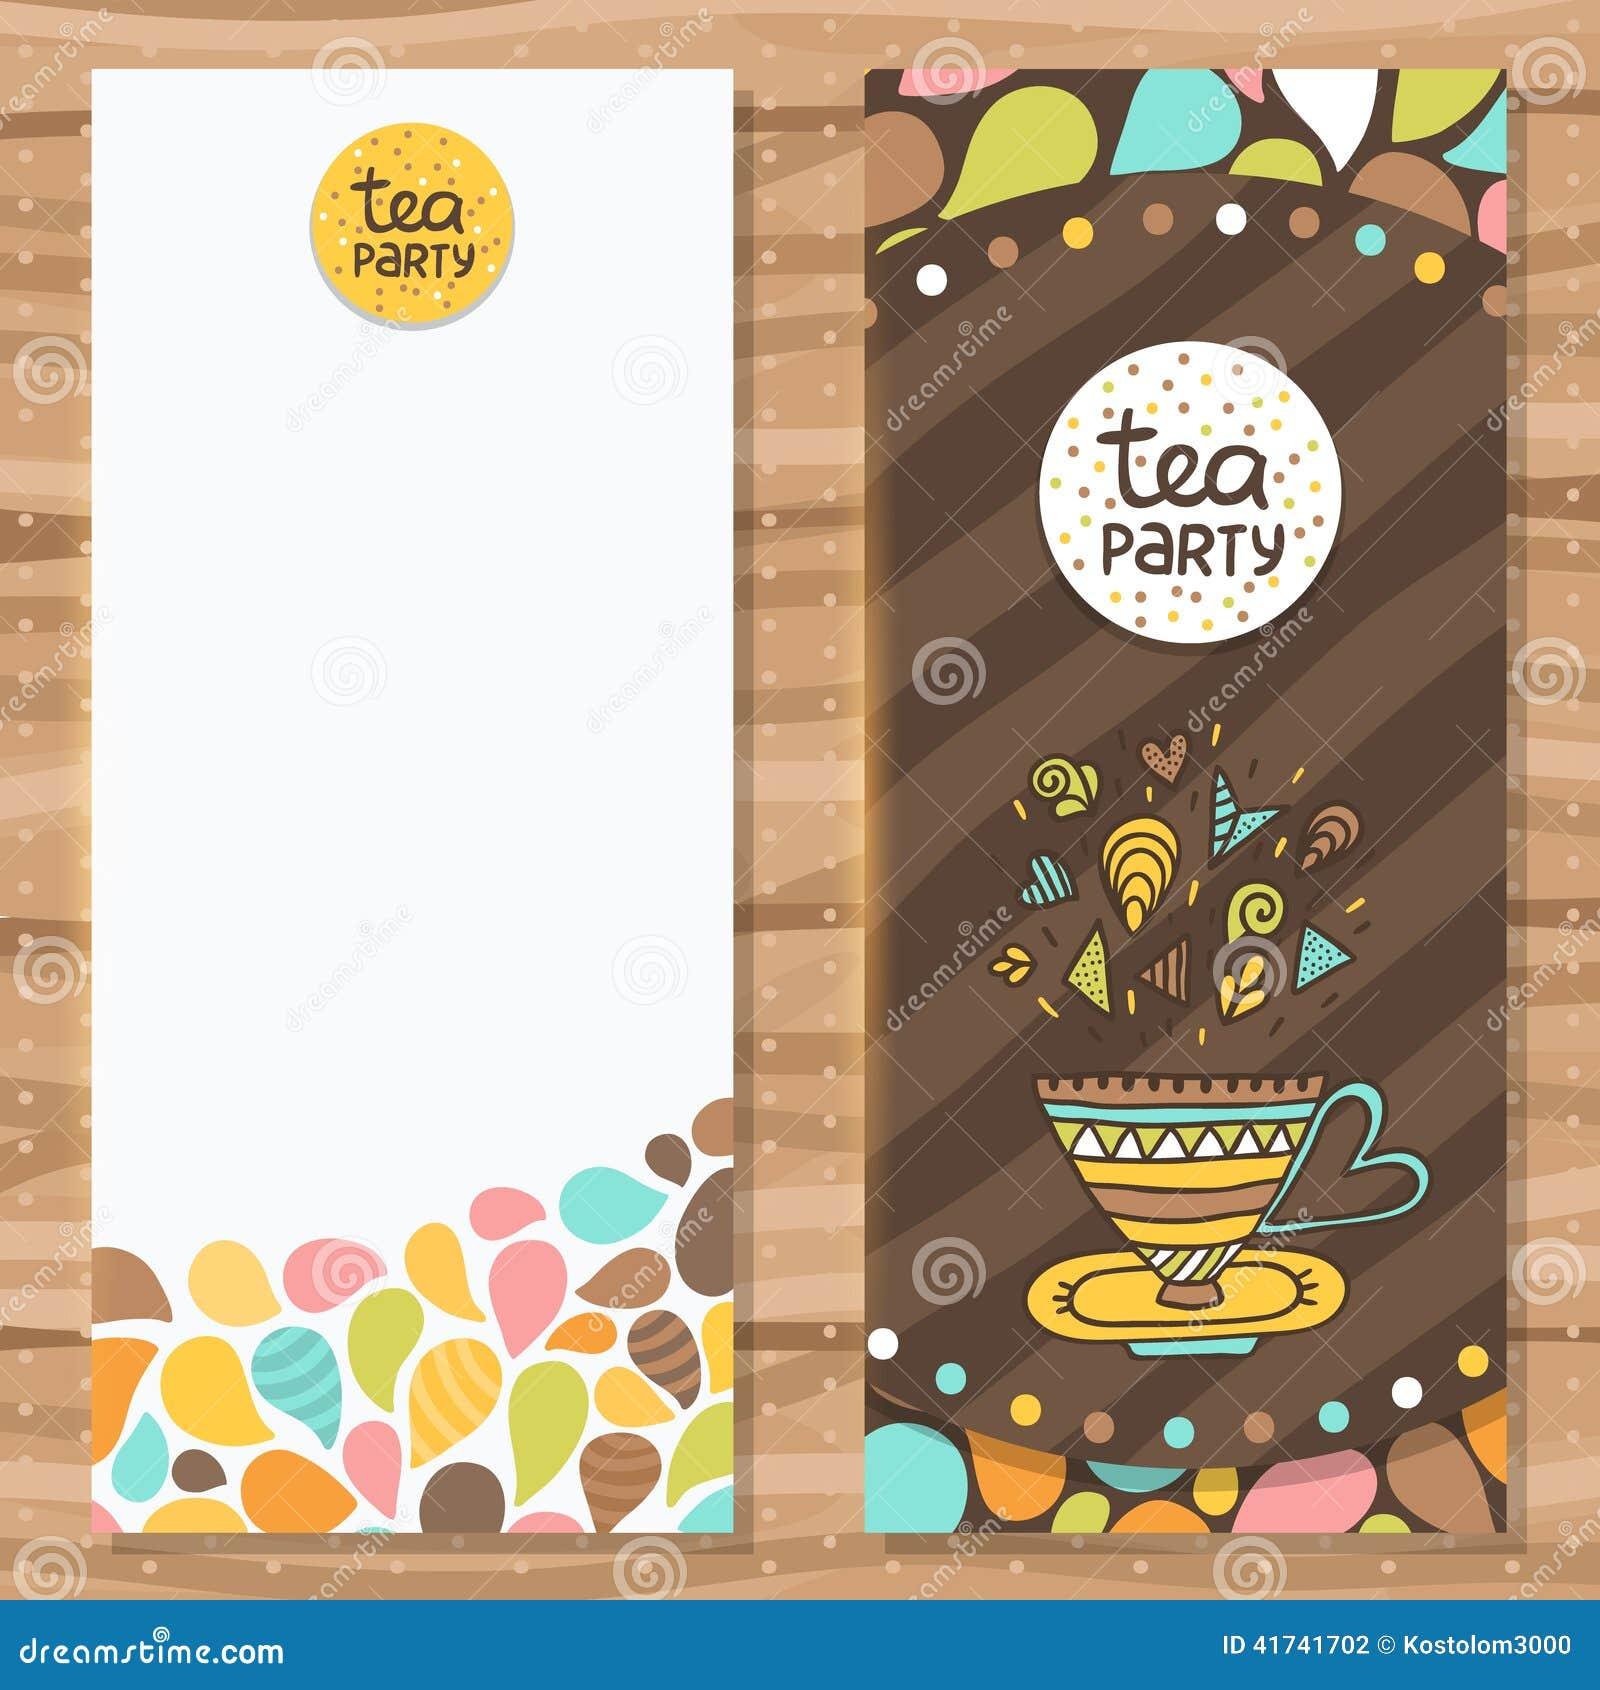 tea party brochure template  cute flyer design  stock